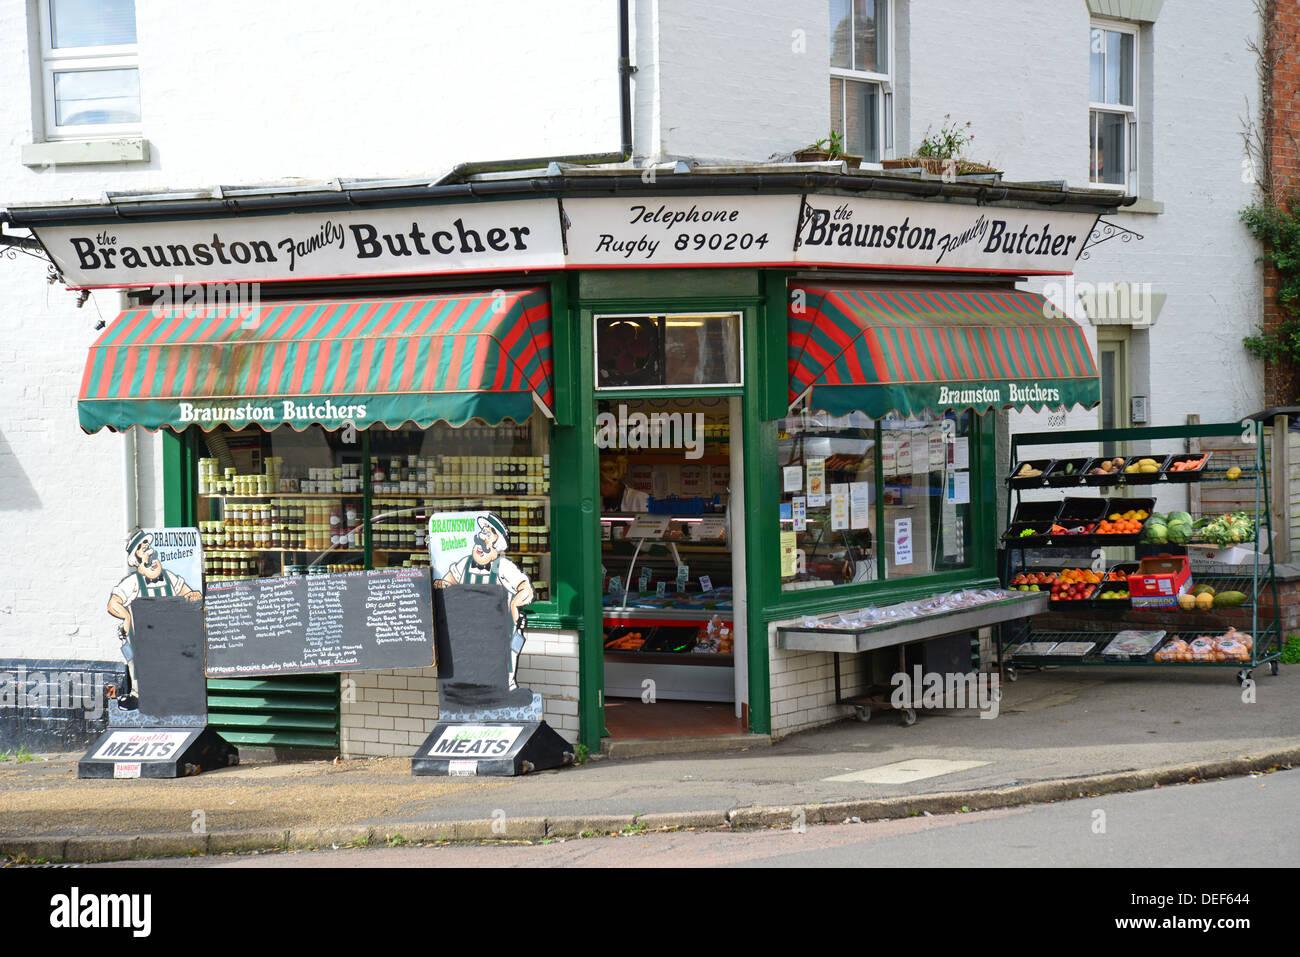 Braunston Family Butcher, High Street, Braunston, Northamptonshire, England, United Kingdom - Stock Image